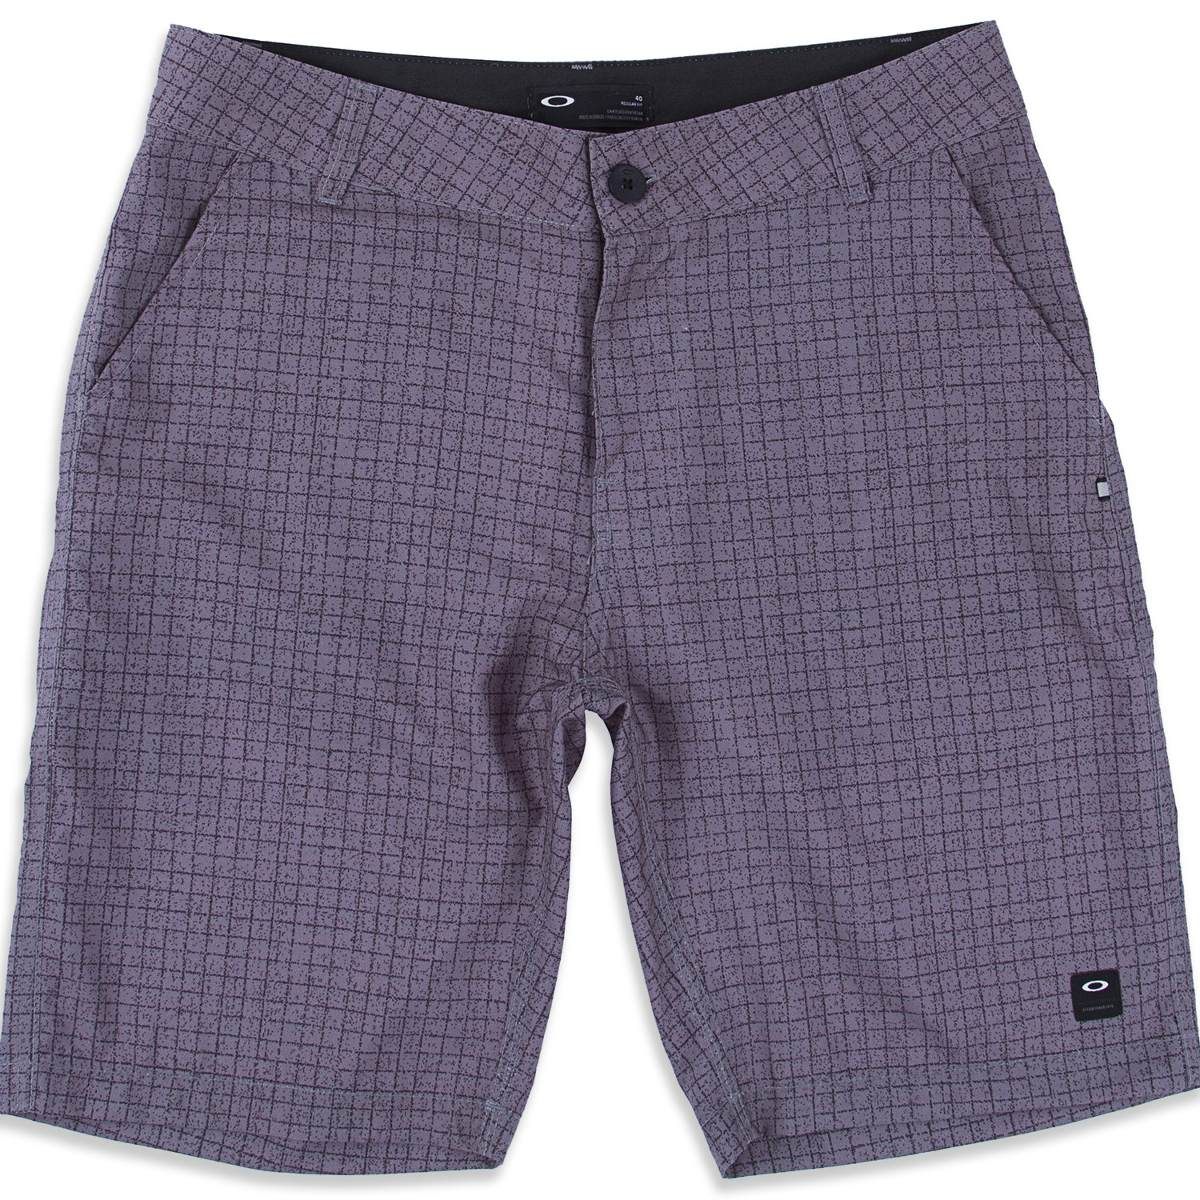 793d3edfe5db4 Bermuda Passeio Oakley Nomad Hybrid Shorts Original - R  239